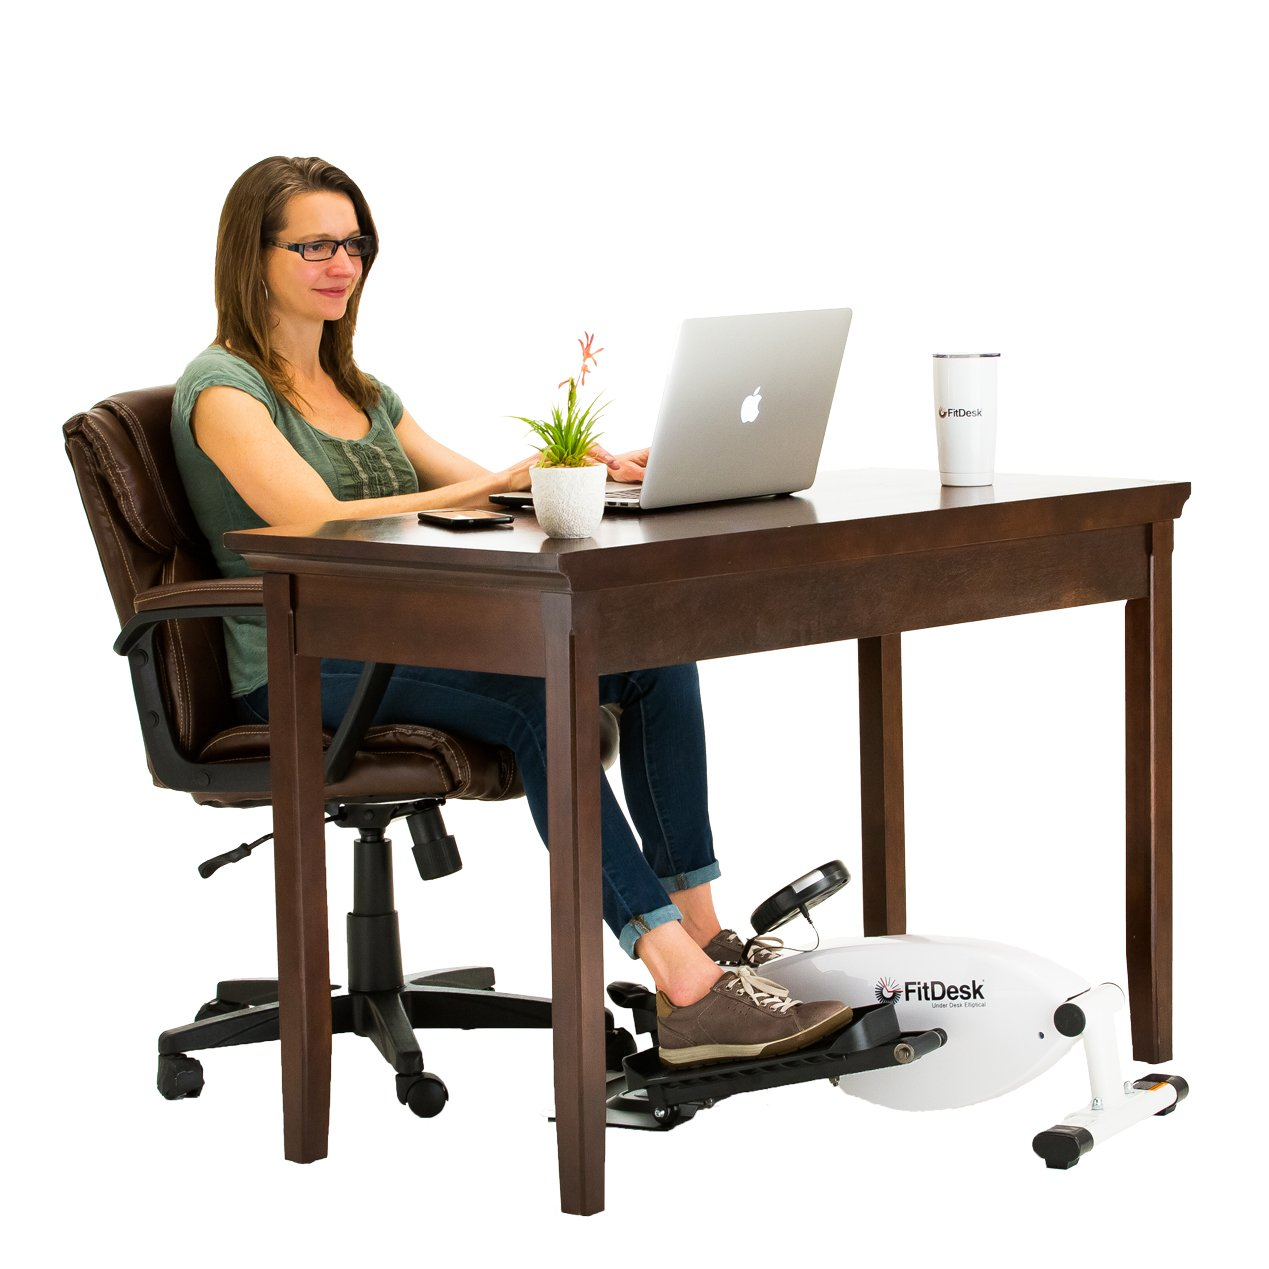 3040 FitDesk Under Desk Elliptical White FD Products Inc